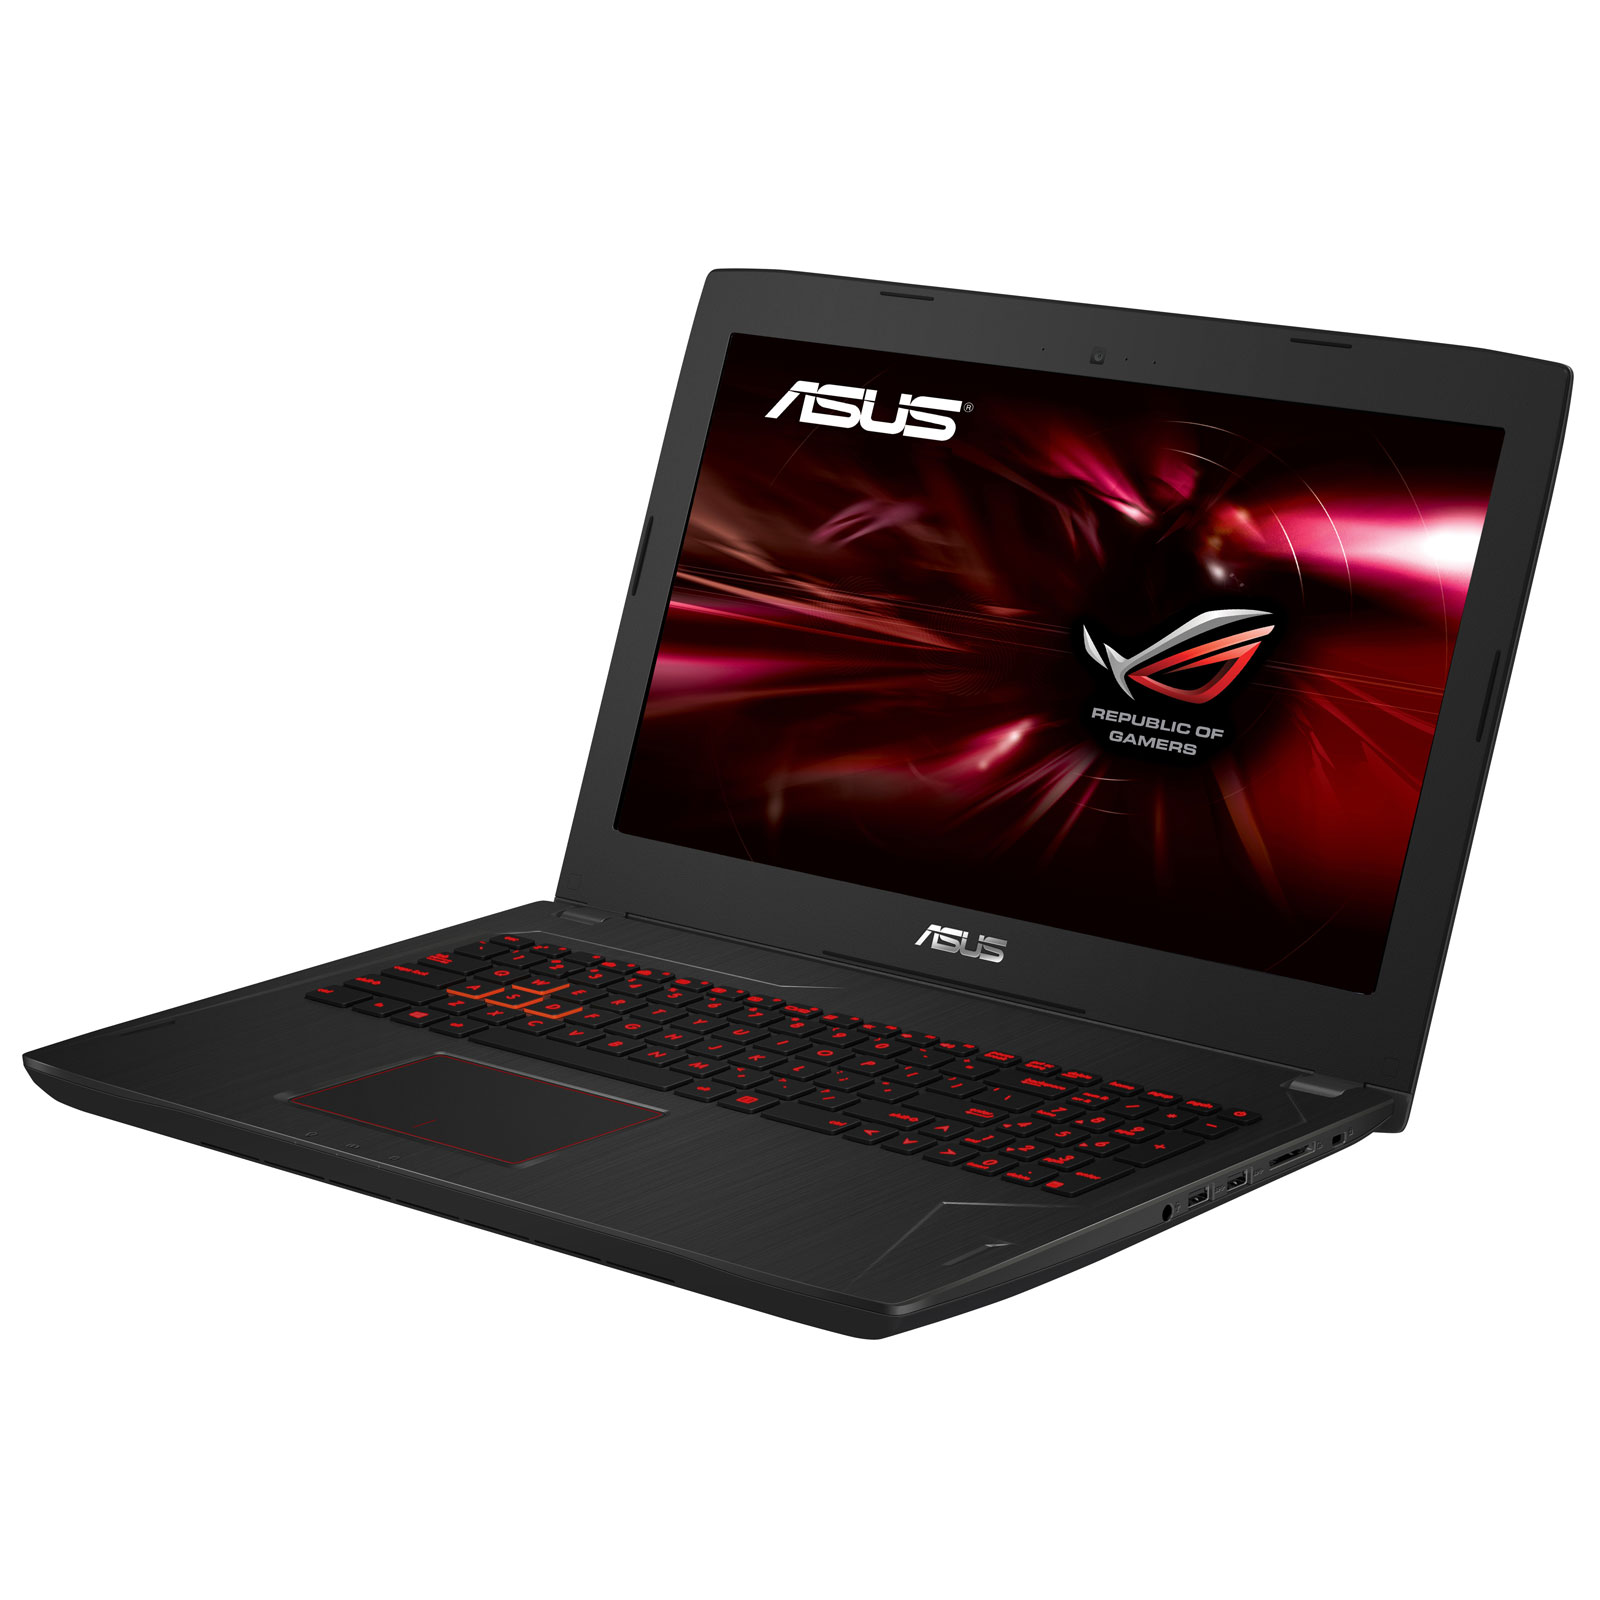 "PC portable ASUS FX502VM-DM092T Intel Core i5-6300HQ 8 Go 1 To 15.6"" LED Full HD NVIDIA GeForce GTX 1060 3 Go Wi-Fi AC/Bluetooth Webcam Windows 10 Famille 64 bits (garantie constructeur 2 ans)"